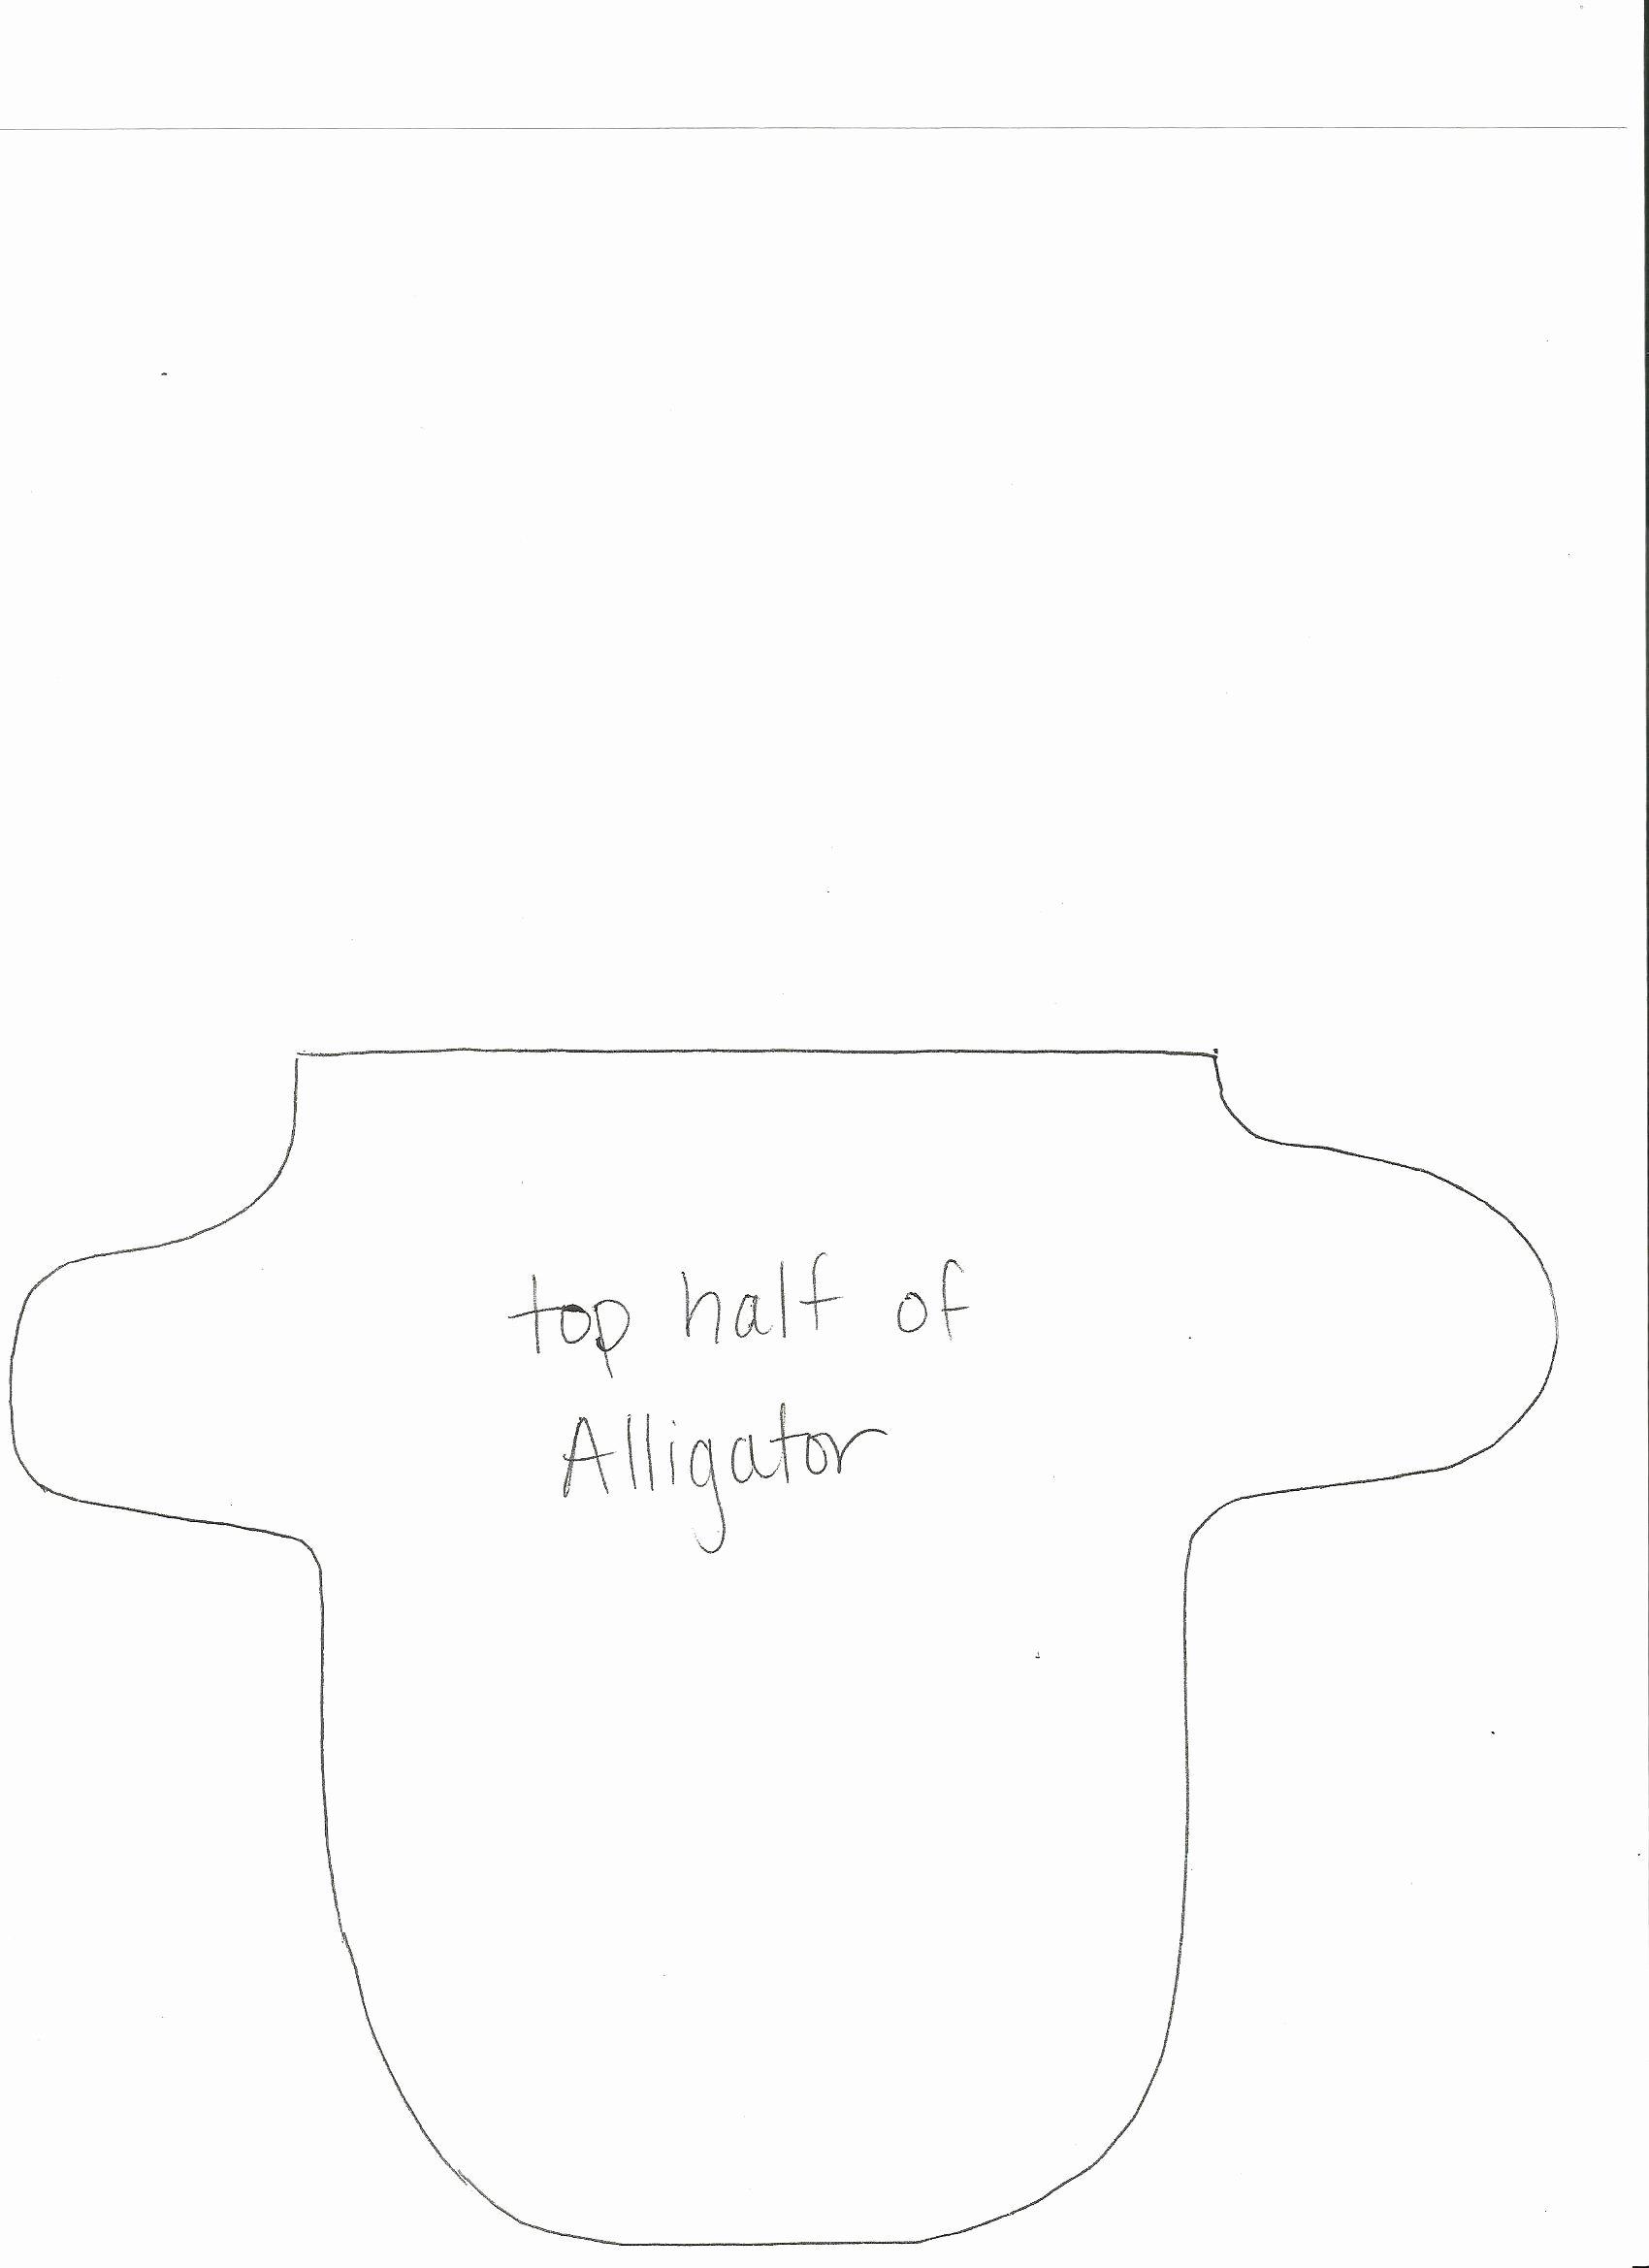 Alligator Template Printable Awesome Alligator Egg Carton Craft